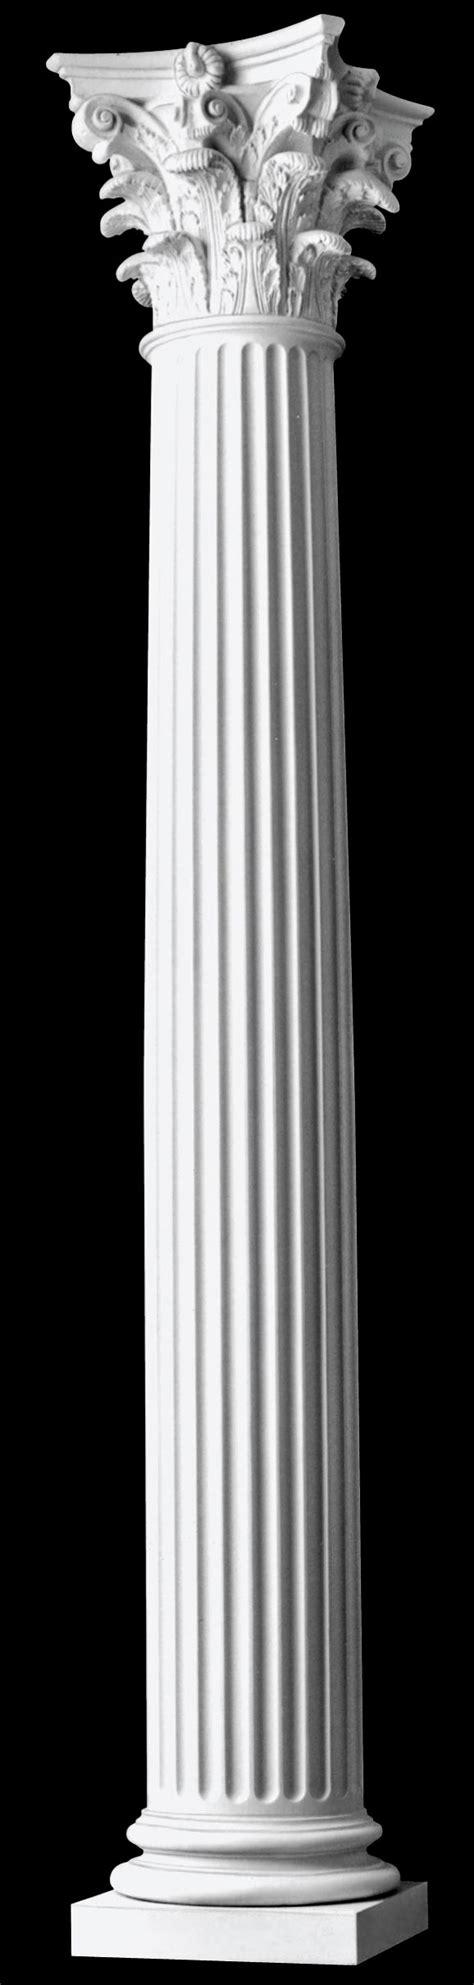 Column L by Architectural Columns Fluted Corinthian Wood Columns